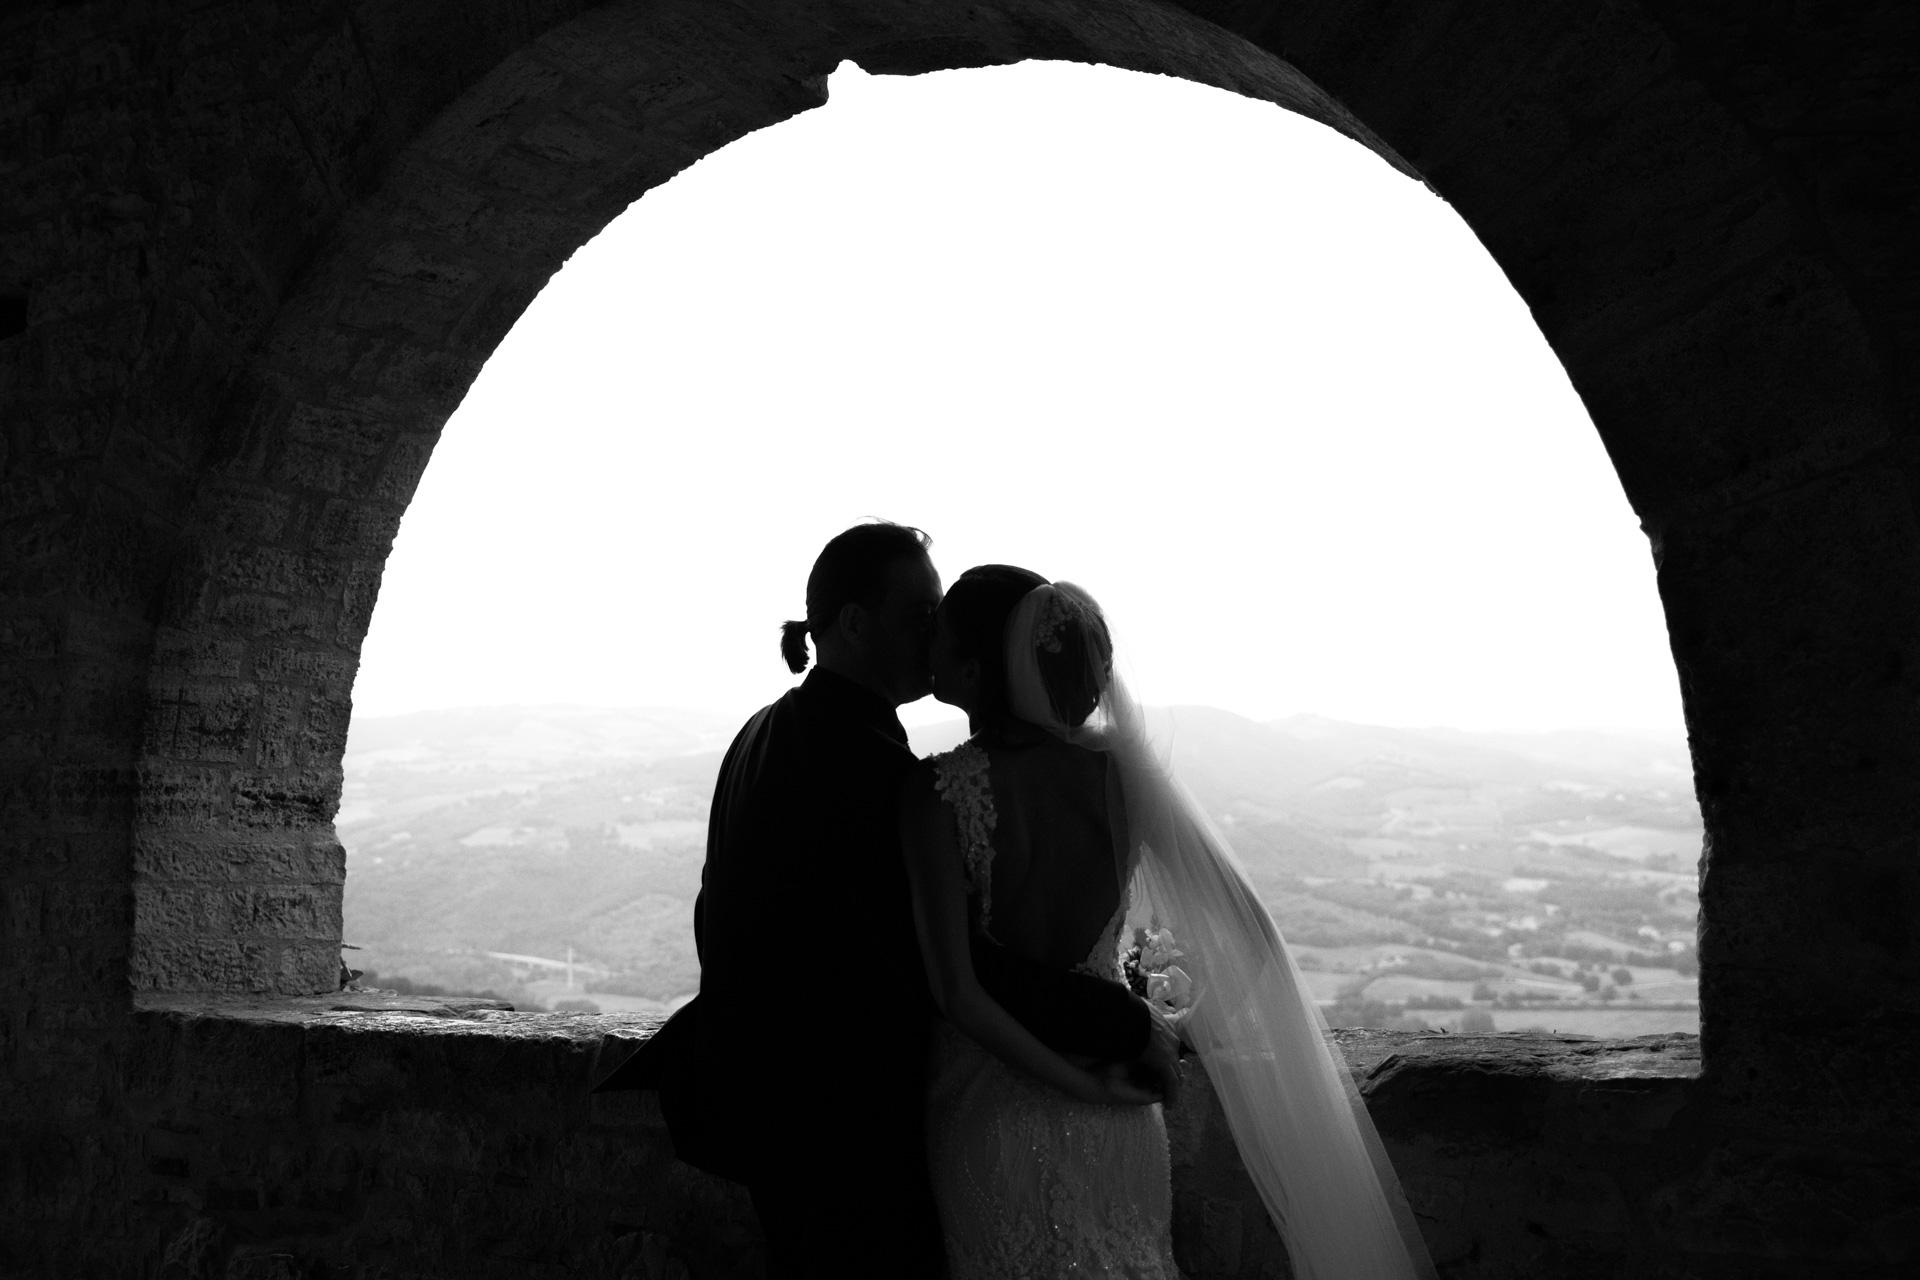 The newlyweds kiss in Todi